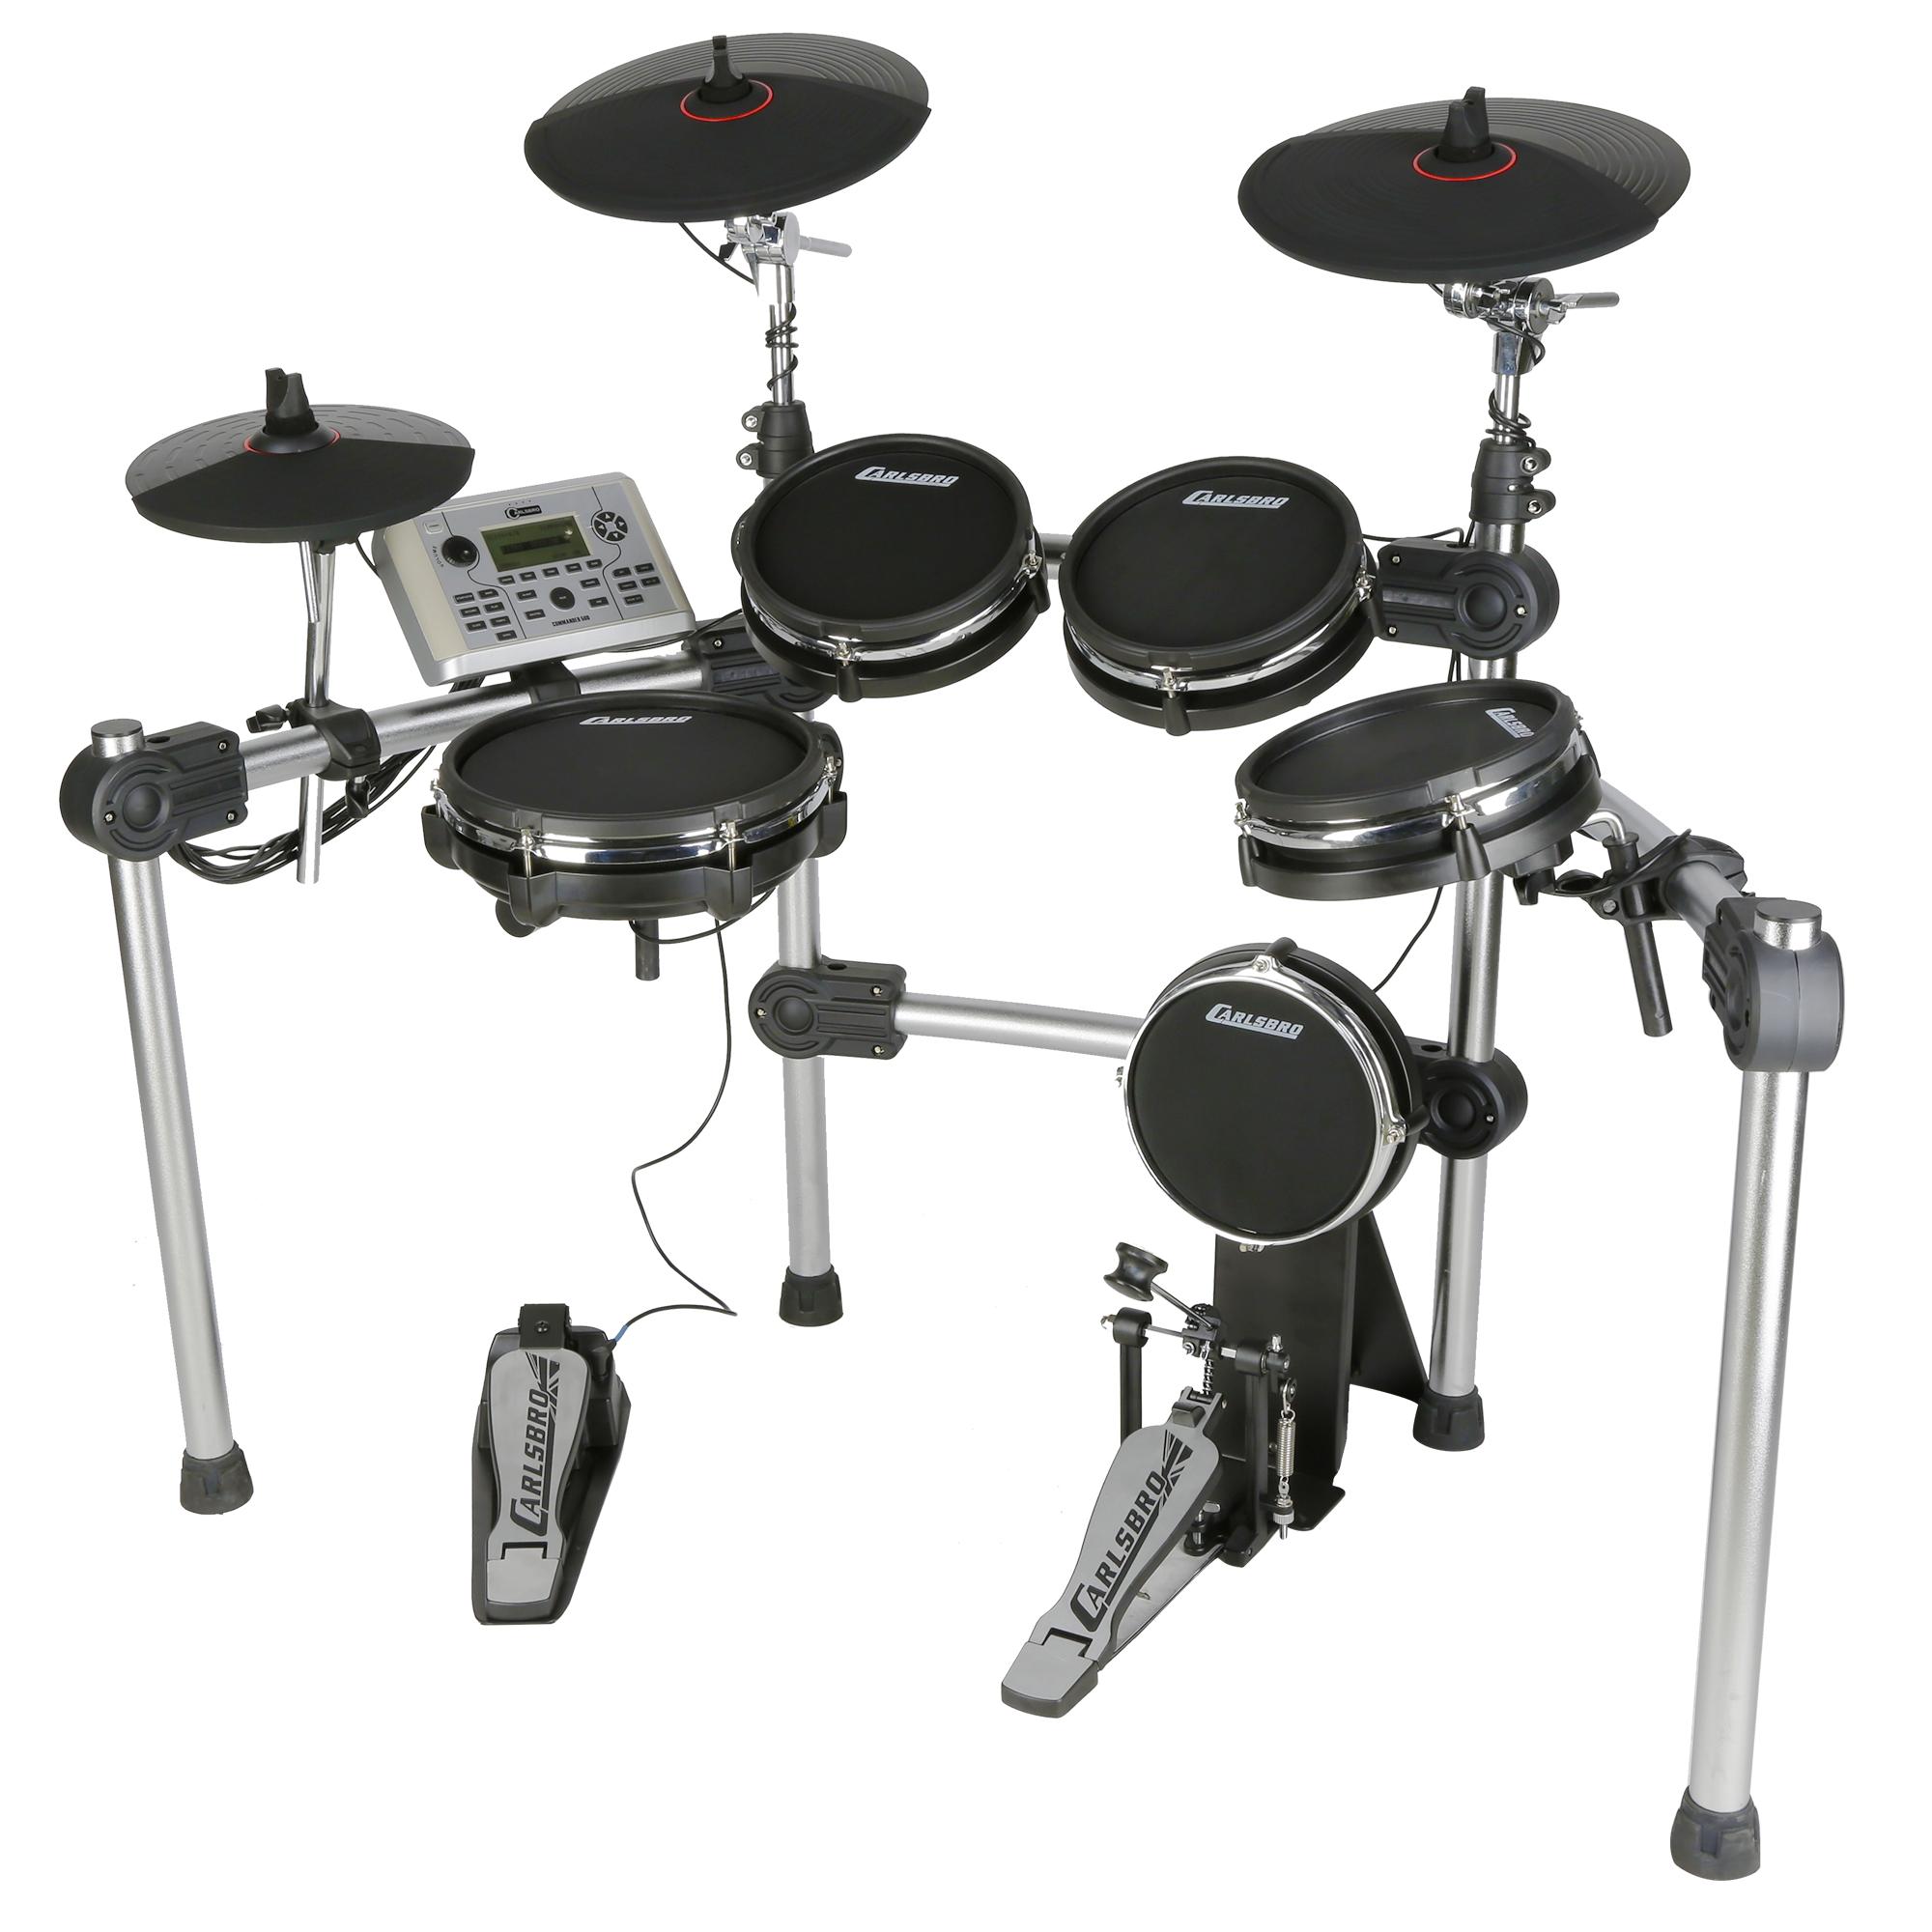 CARLSBRO CSD500 8 Piece Electronic Drum Kit